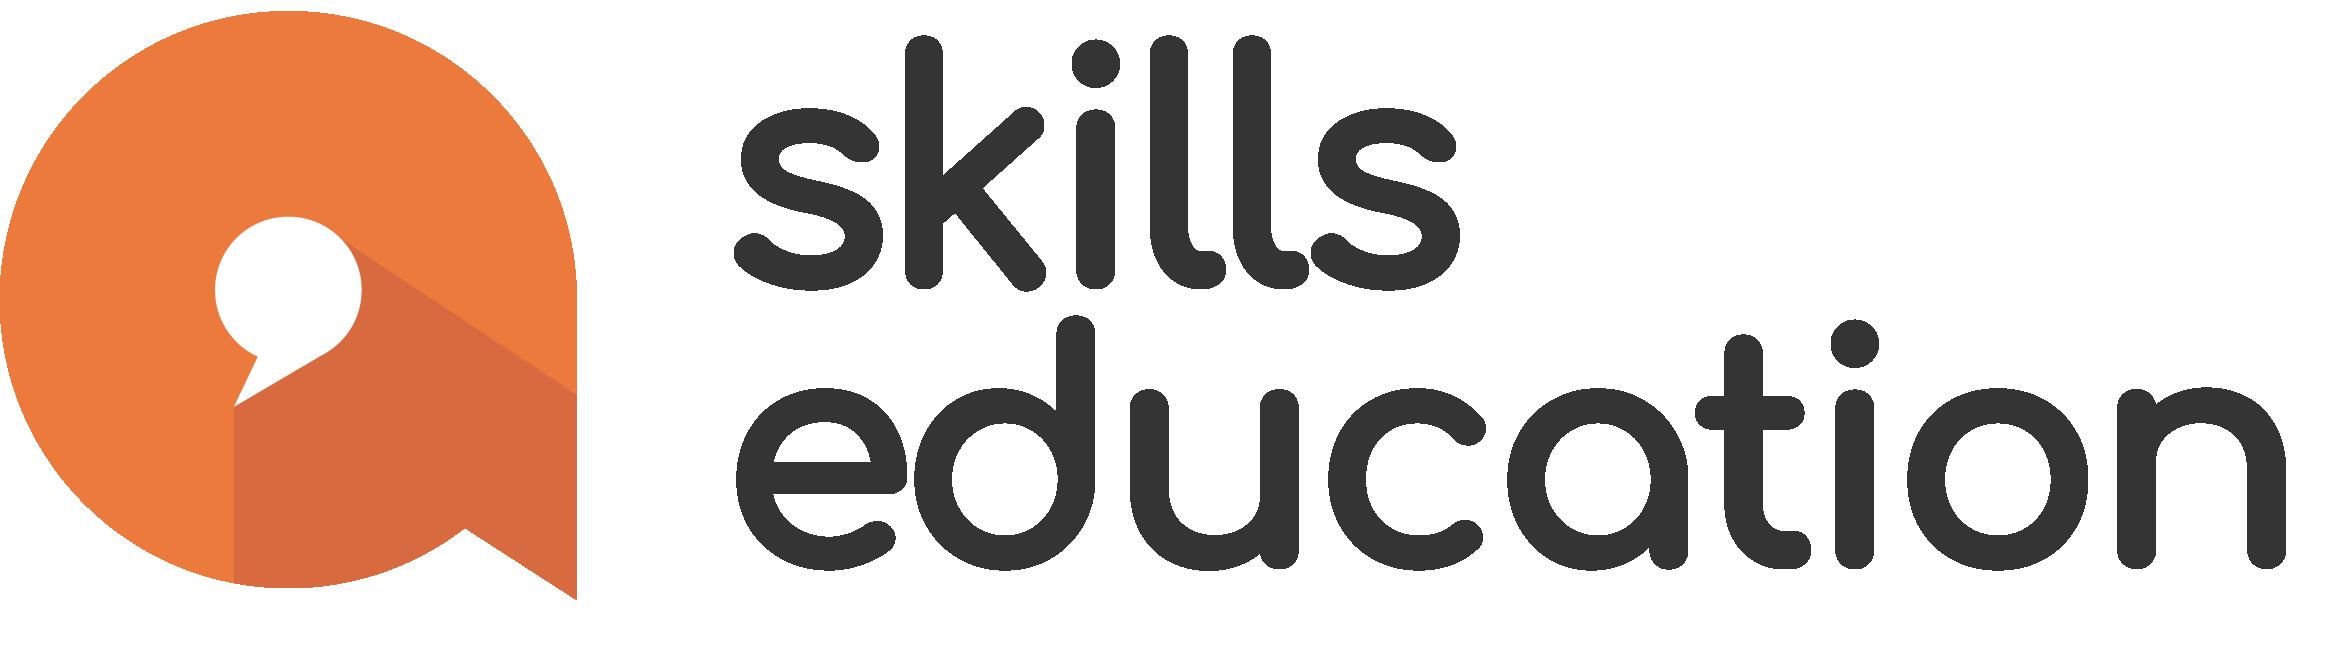 Australian Skills Network logo